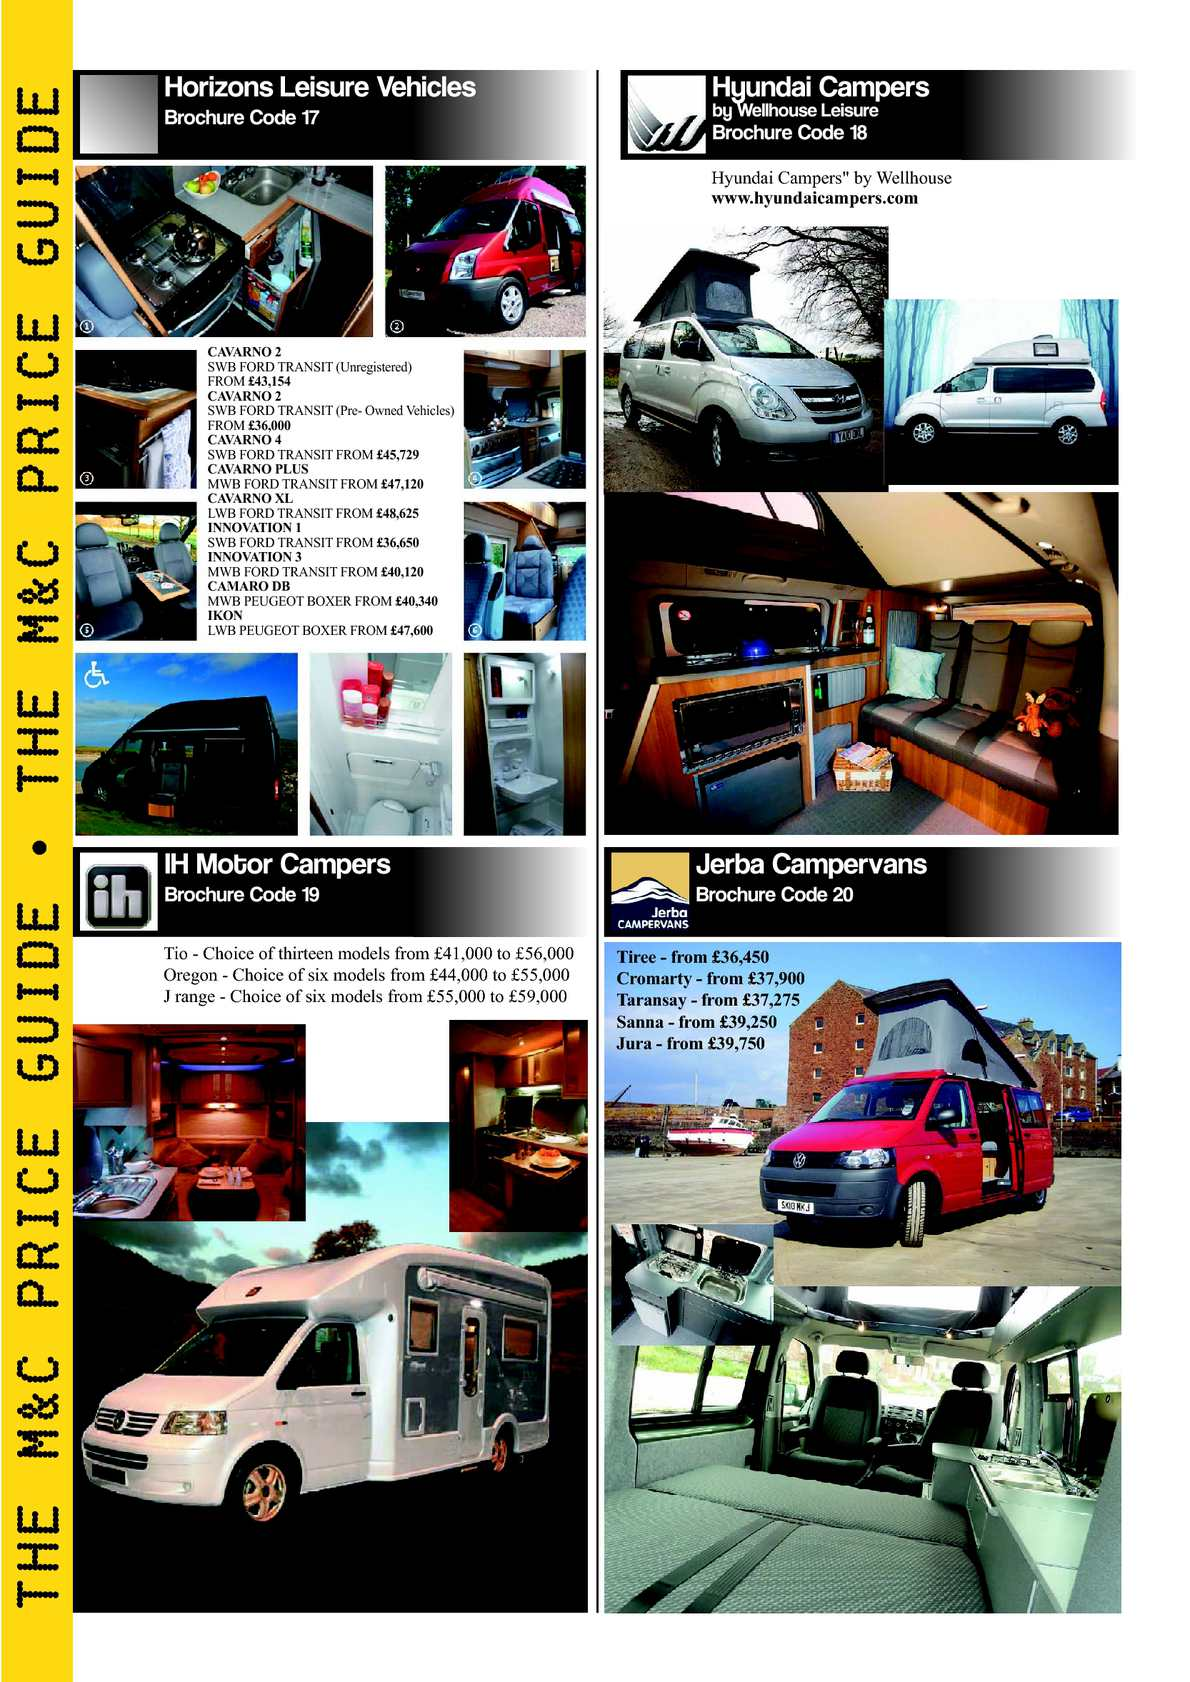 Feb 2013 motorhome campervan calameo downloader page 77 fandeluxe Gallery